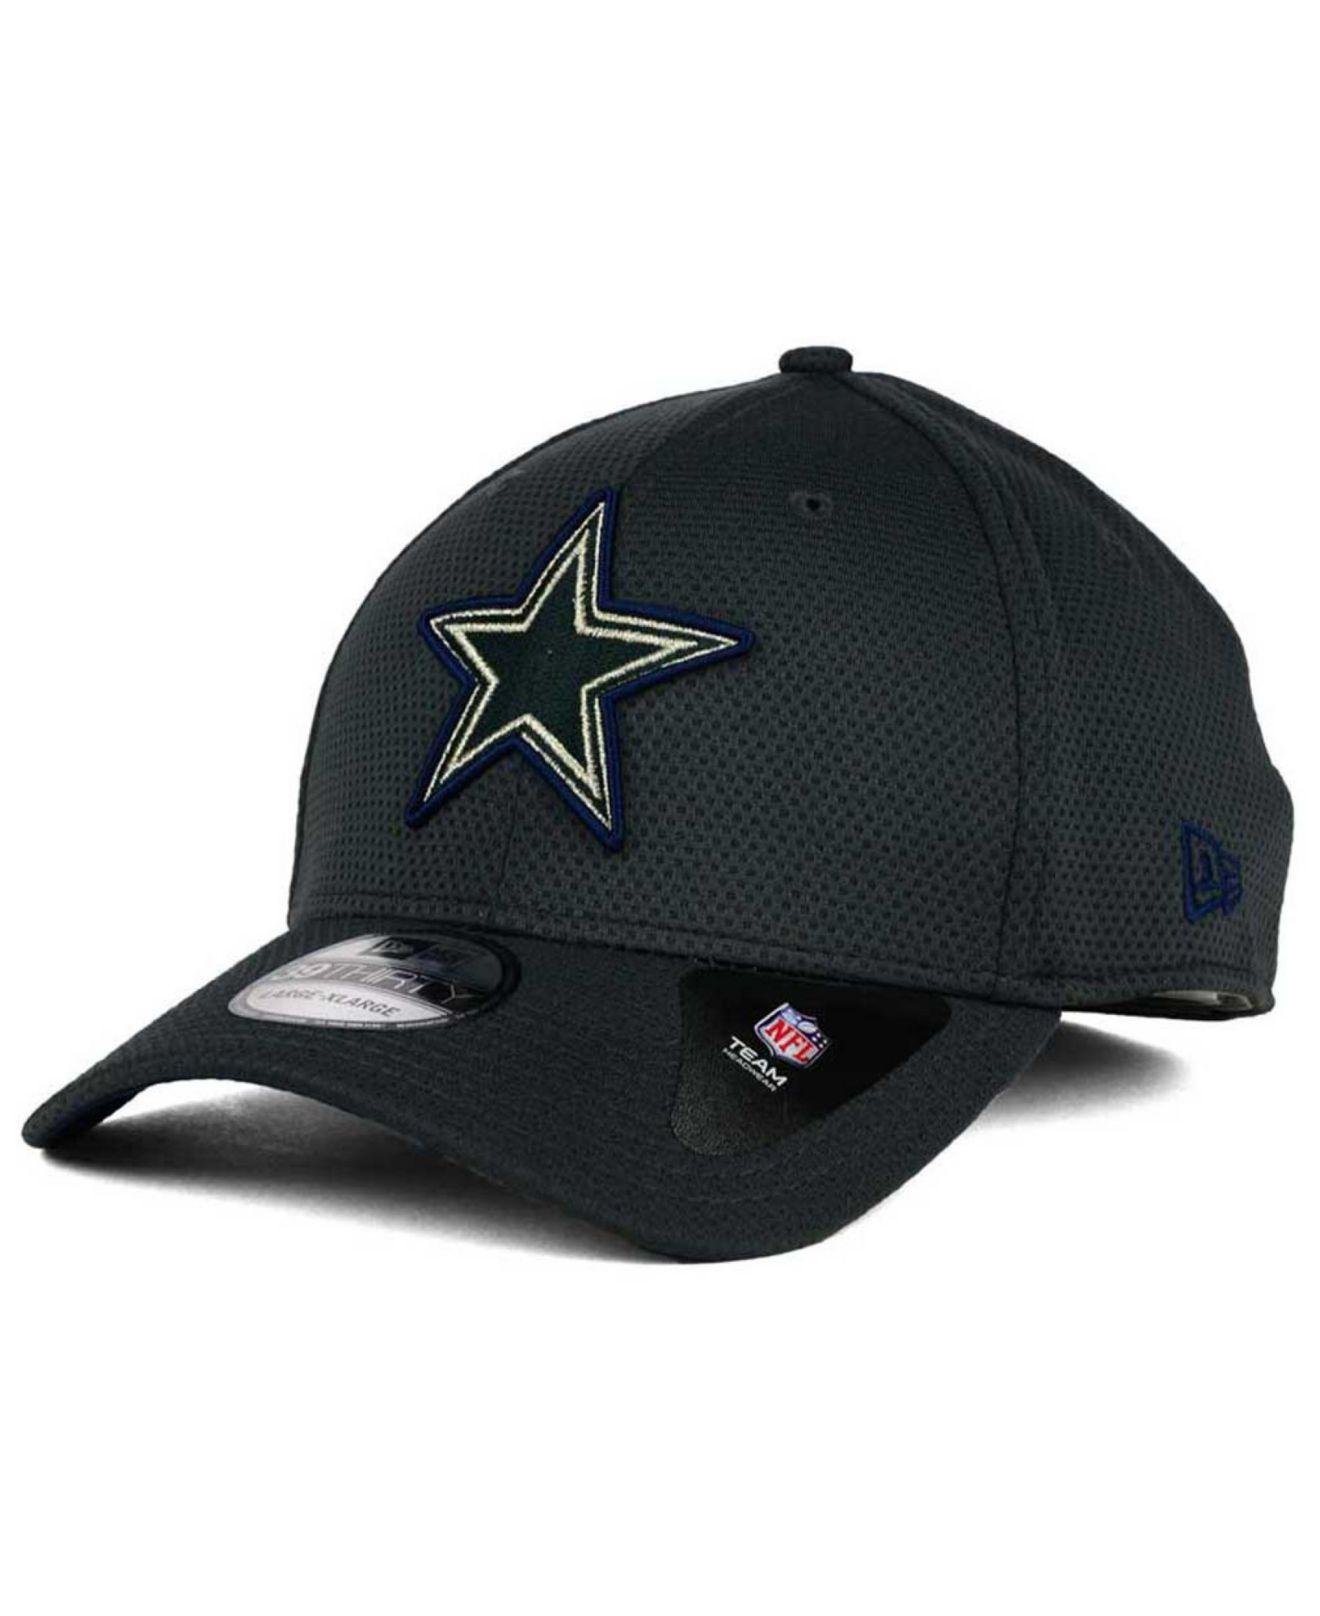 Lyst - Ktz Dallas Cowboys Graphpop Tech 39thirty Cap in Blue for Men 635cf11d0